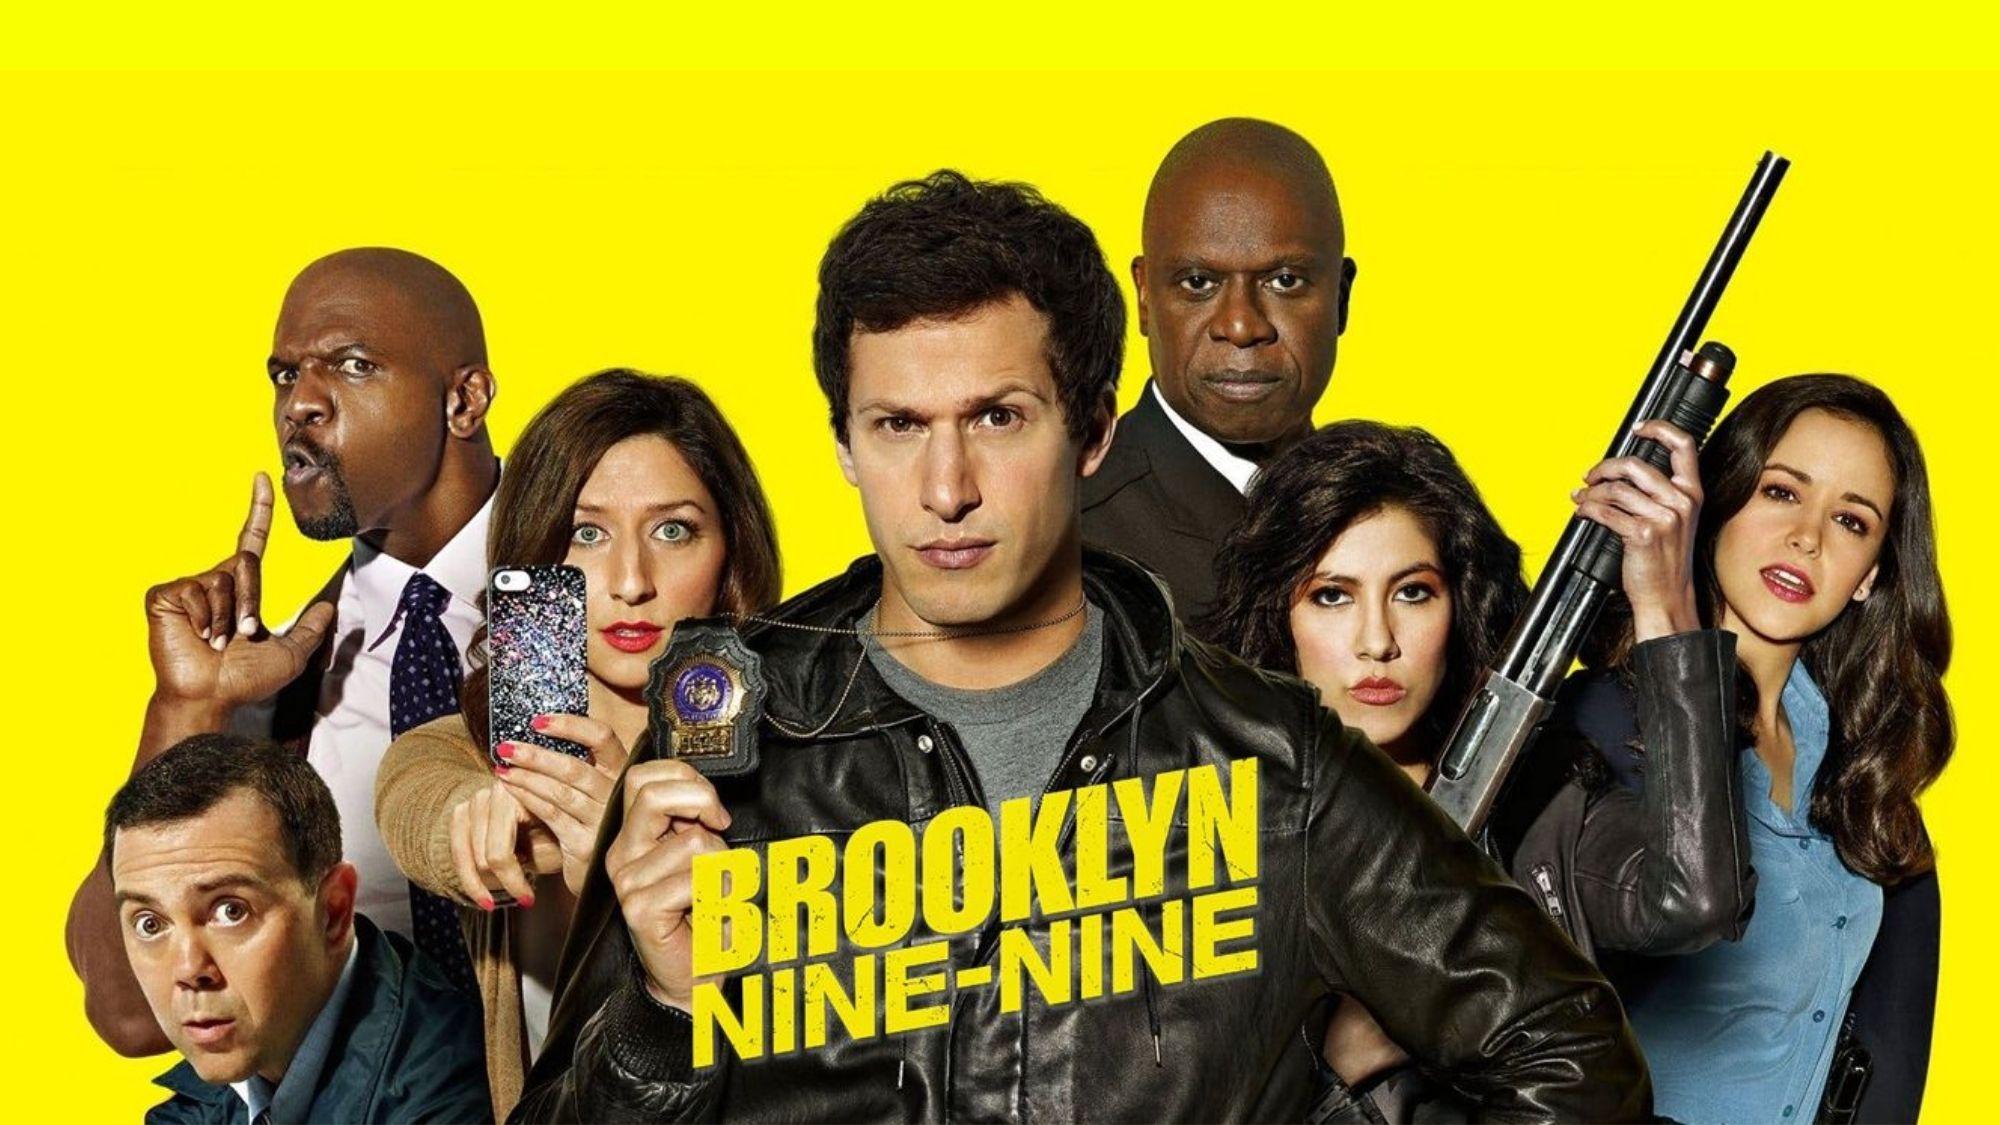 Brooklyn Nine-Nine secures post-Olympics slot for final season premiere